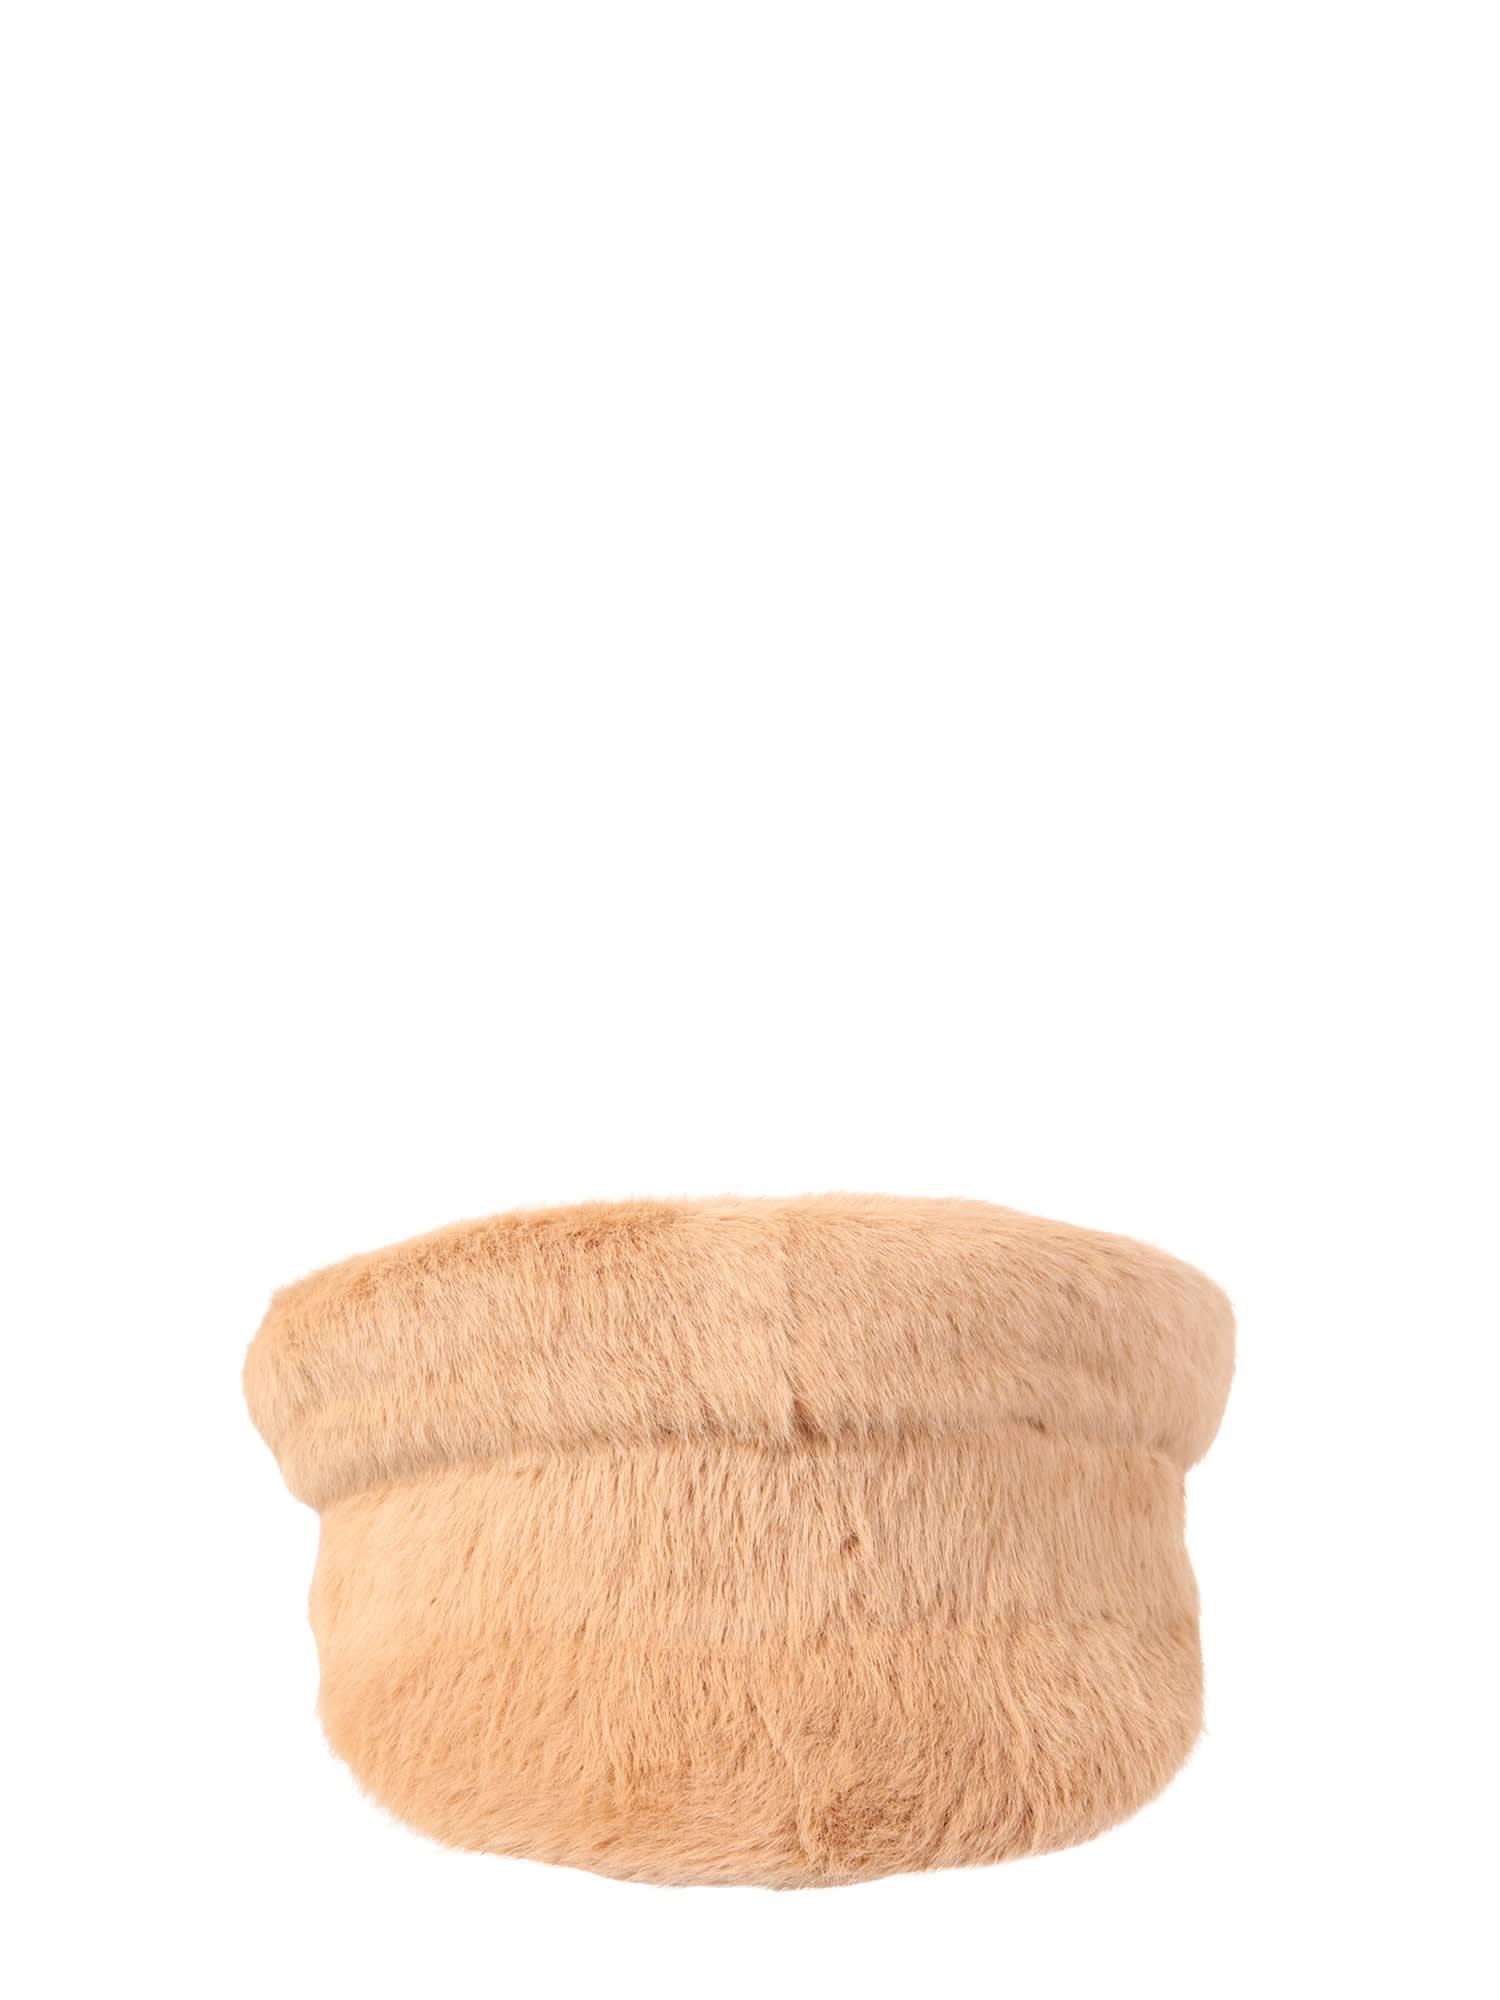 RUSLAN BAGINSKIY BAKER BOY HAT